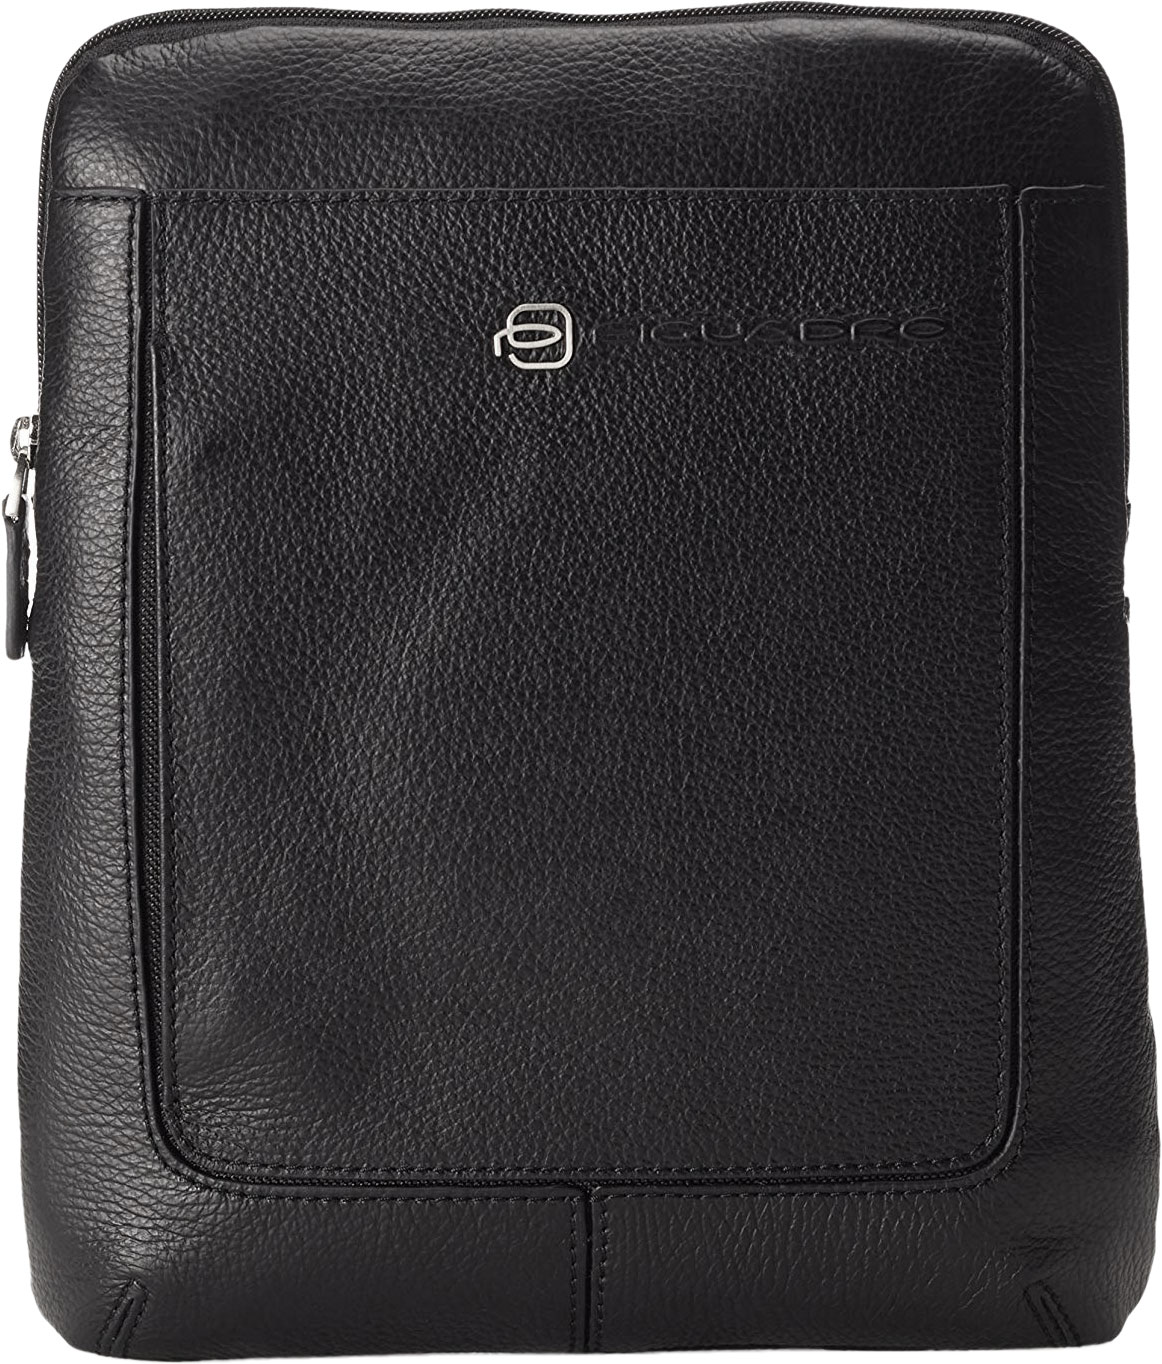 Кожаные сумки Piquadro OUTCA1358VI/N